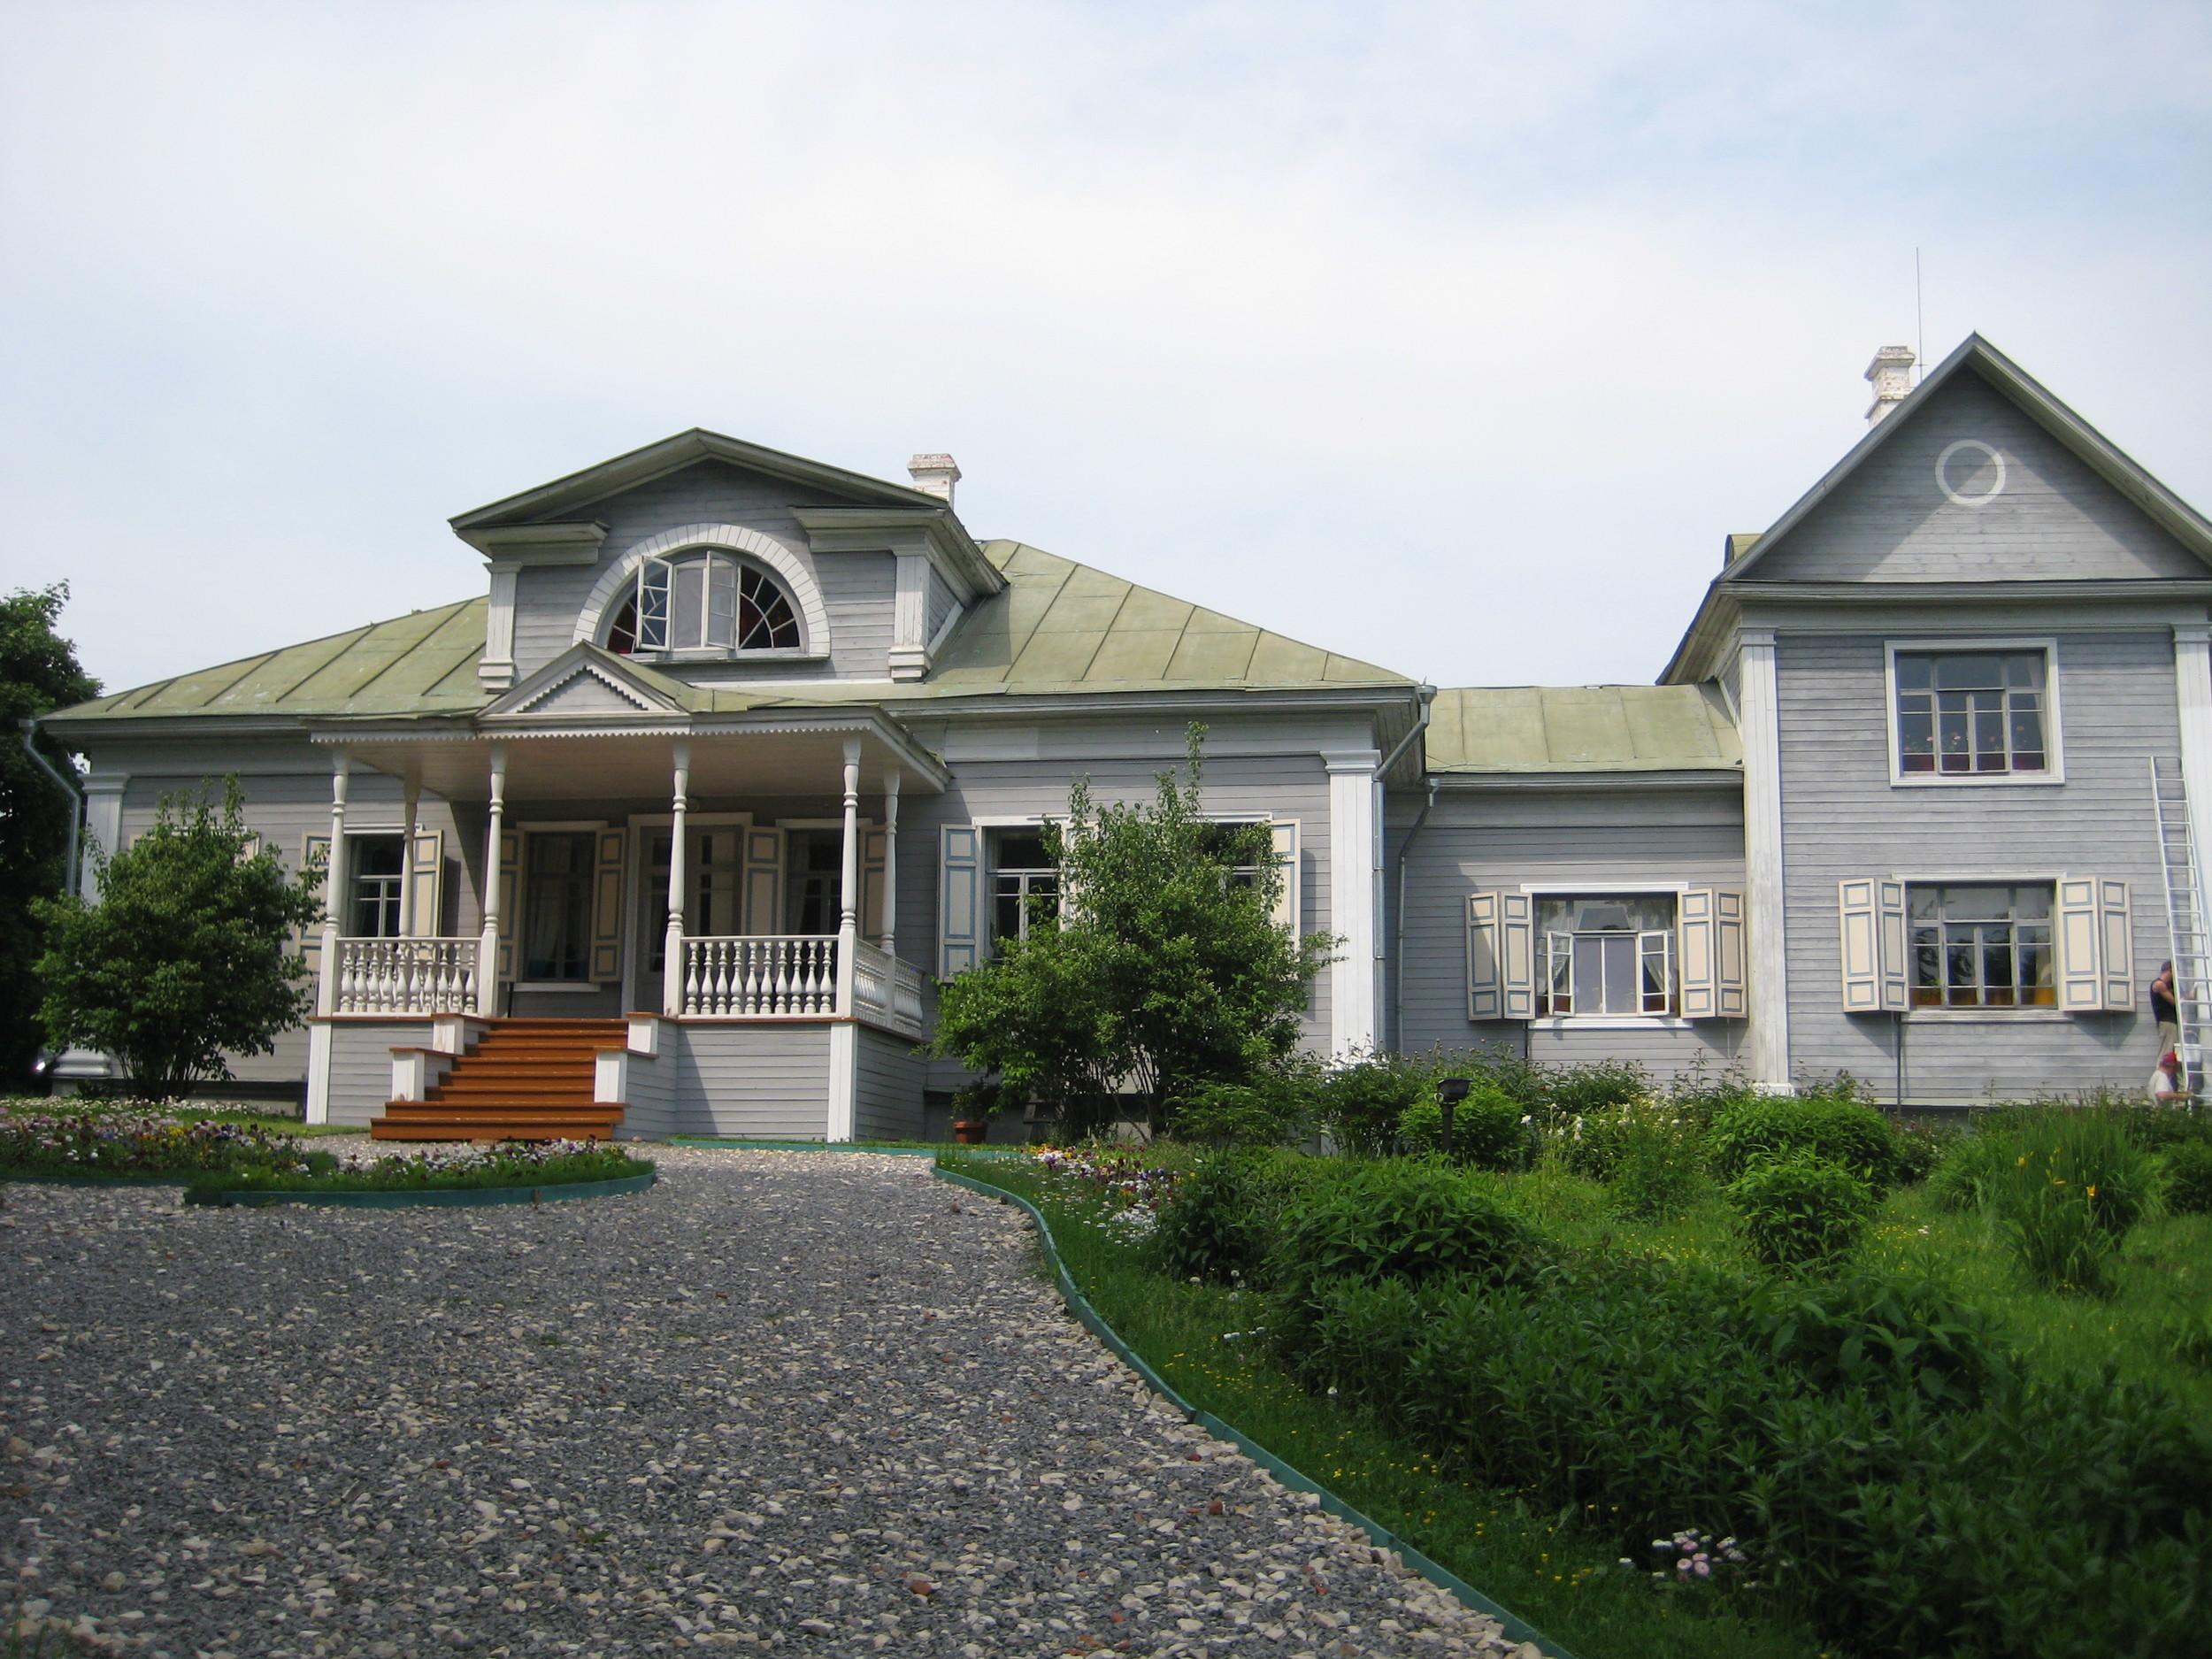 landmark-of-the-week-alexander-bloks-house